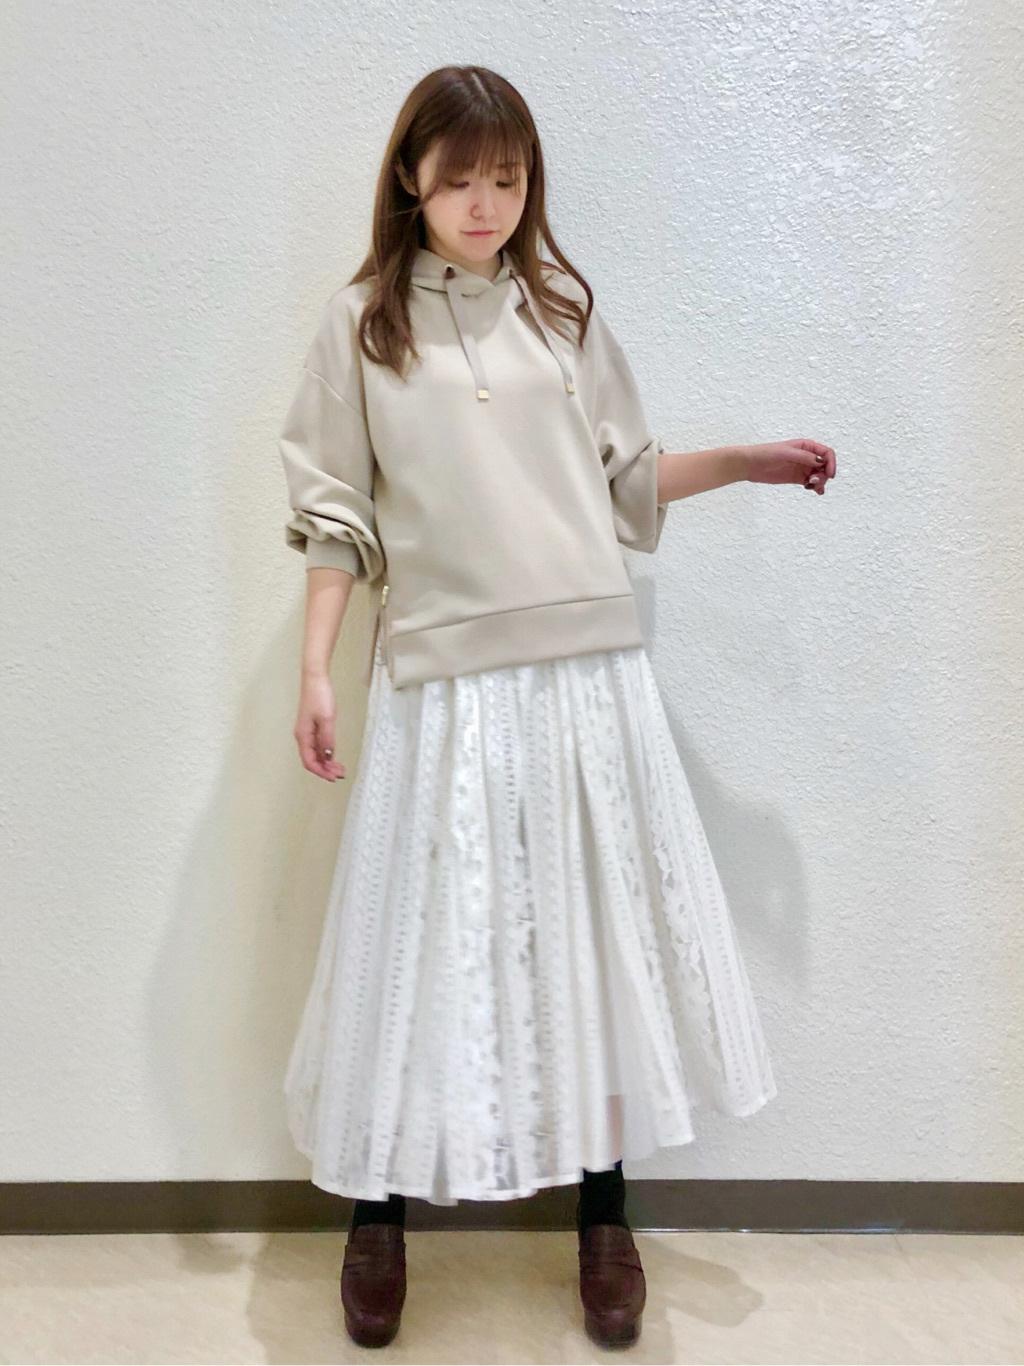 Amika (160cm)